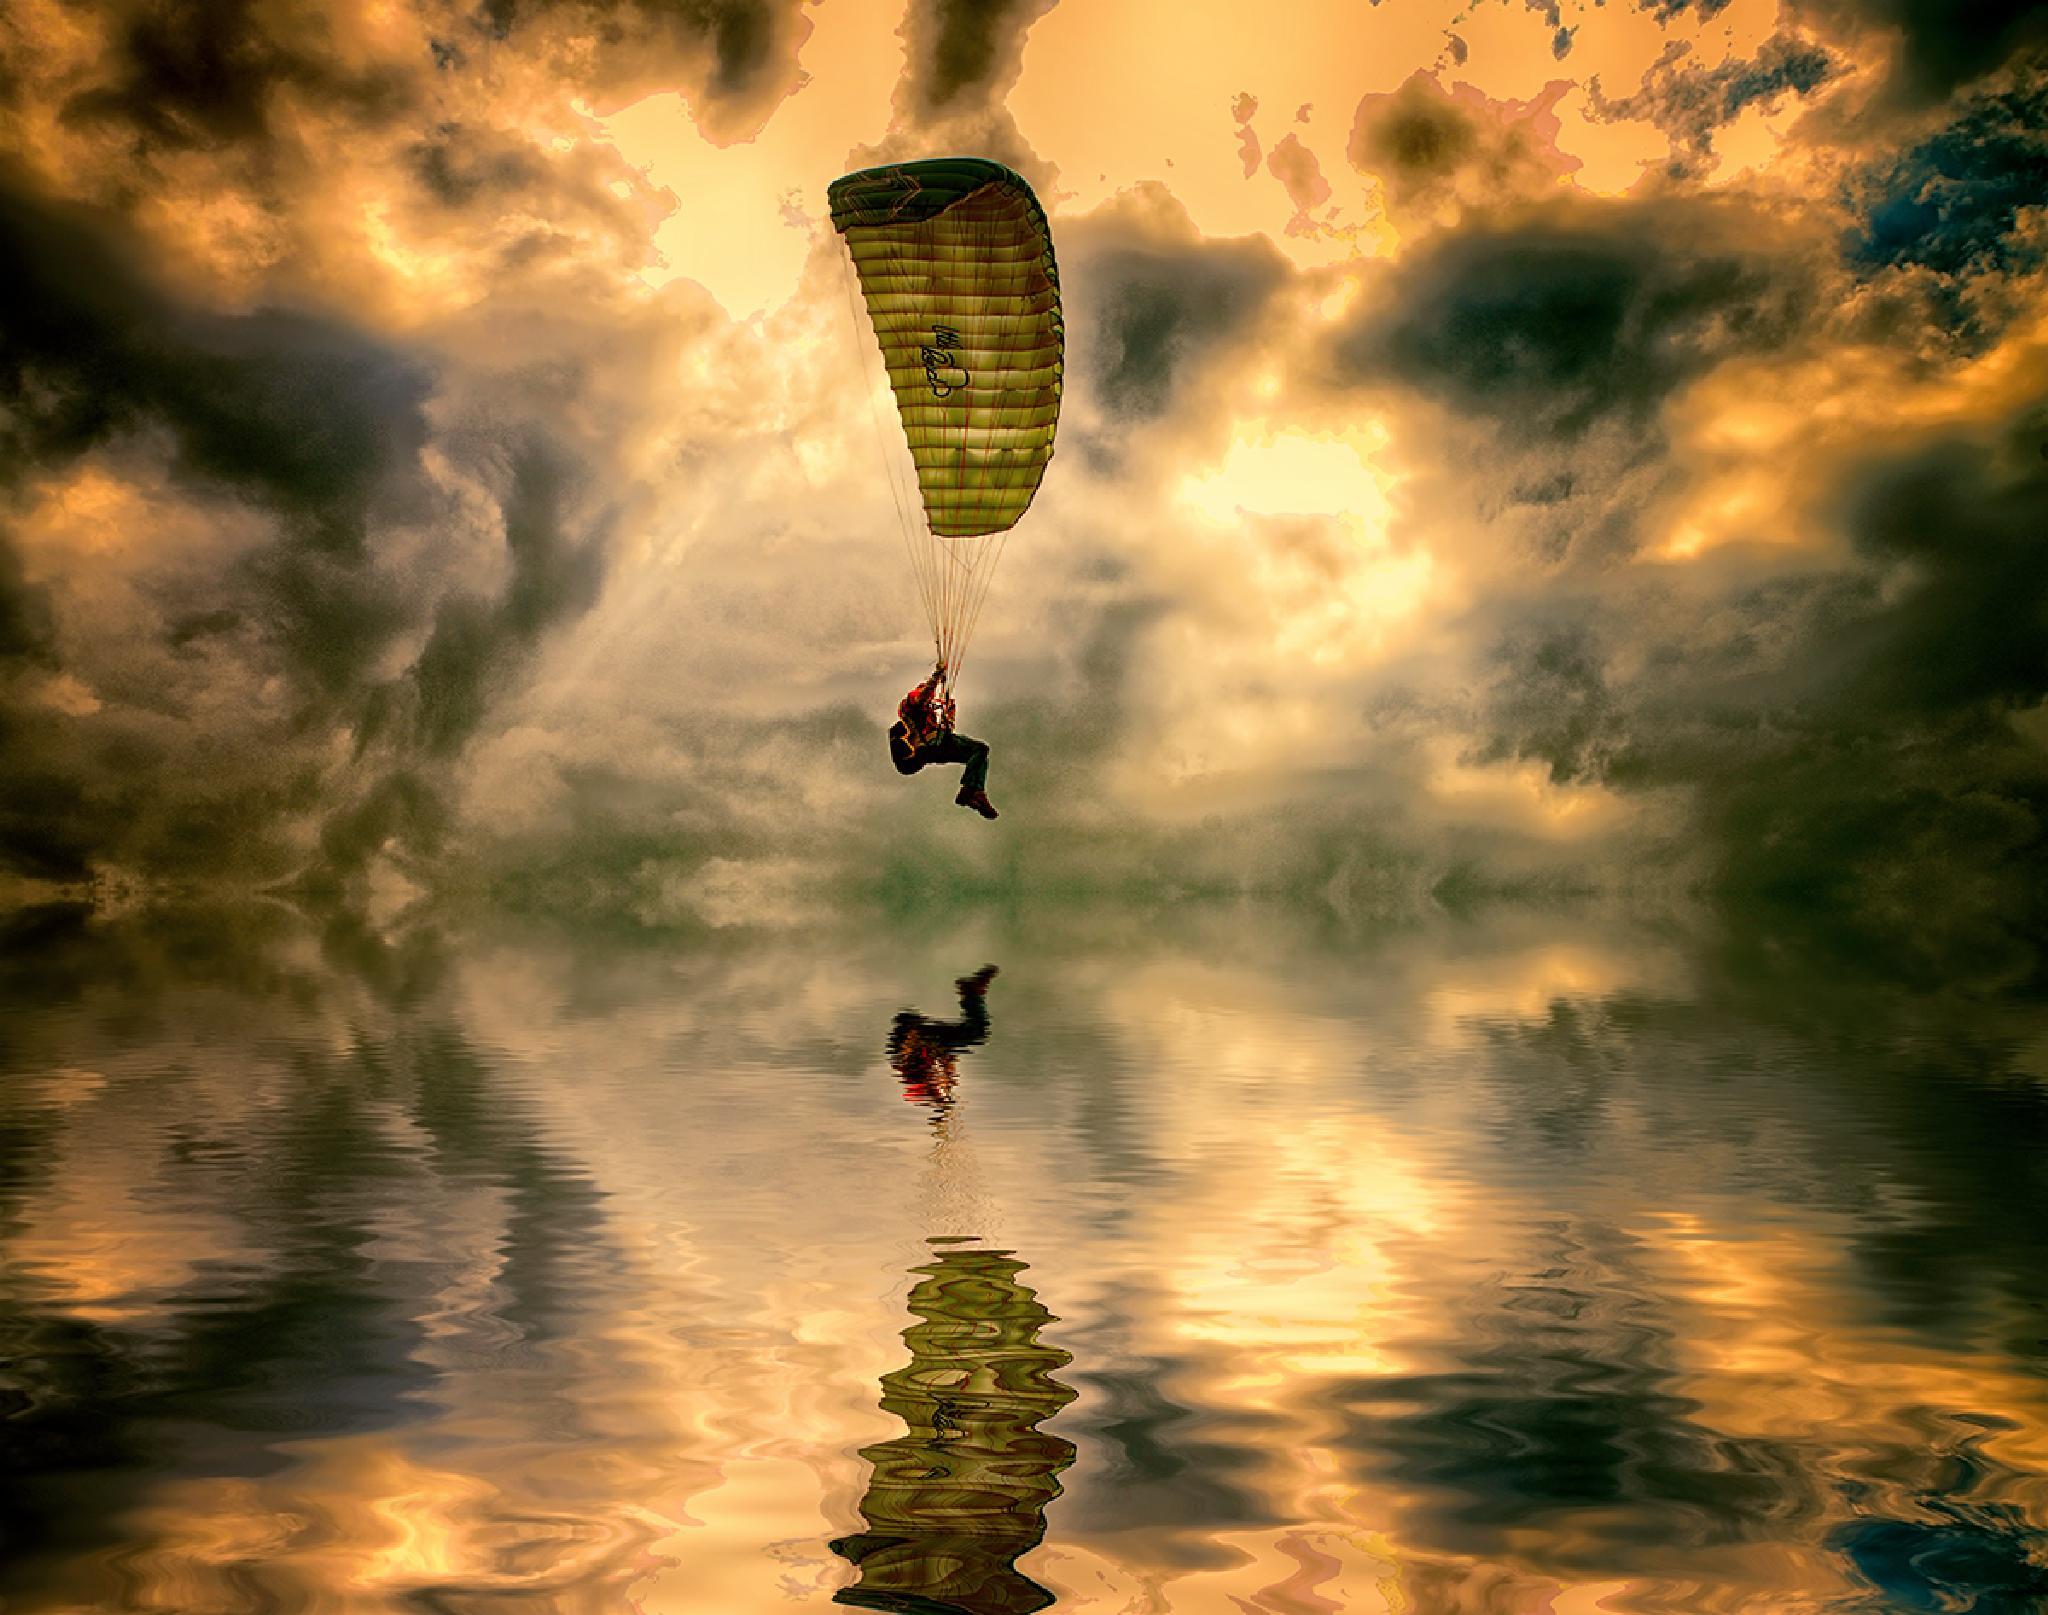 Parachute guy by egonzitter